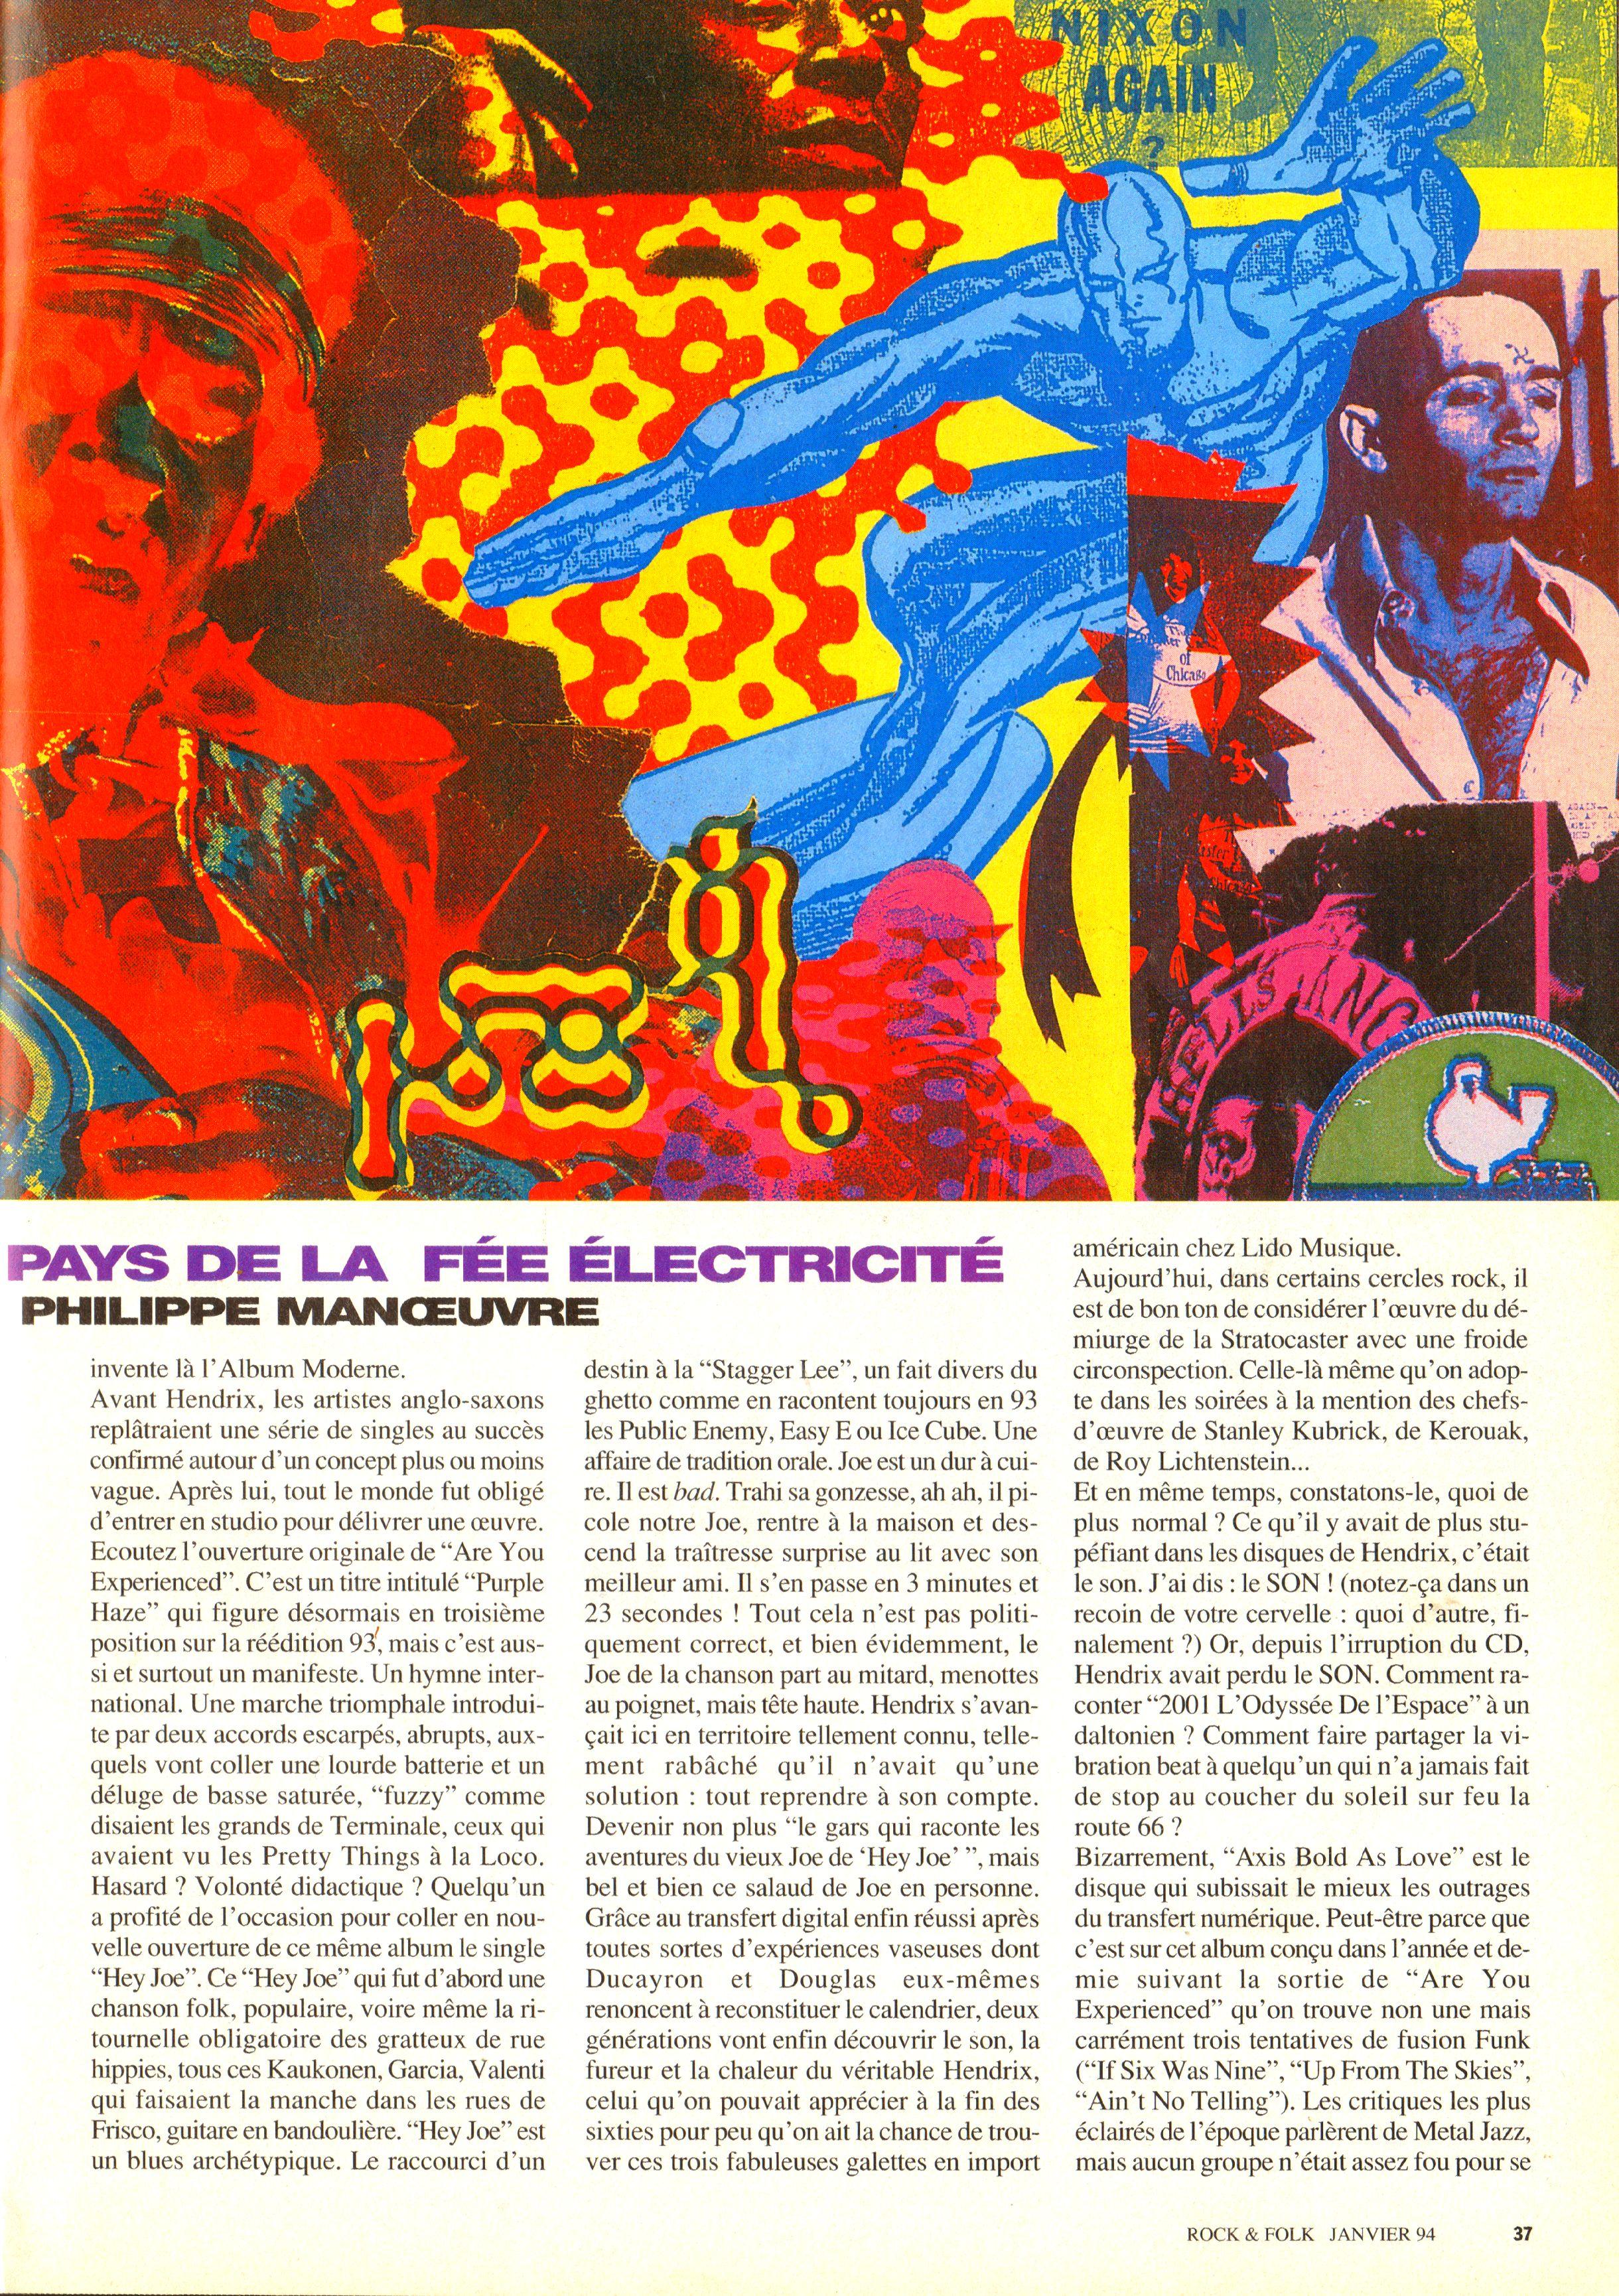 Magazines Français 1989 - 2014 RocketFolkJanvier1994Page37